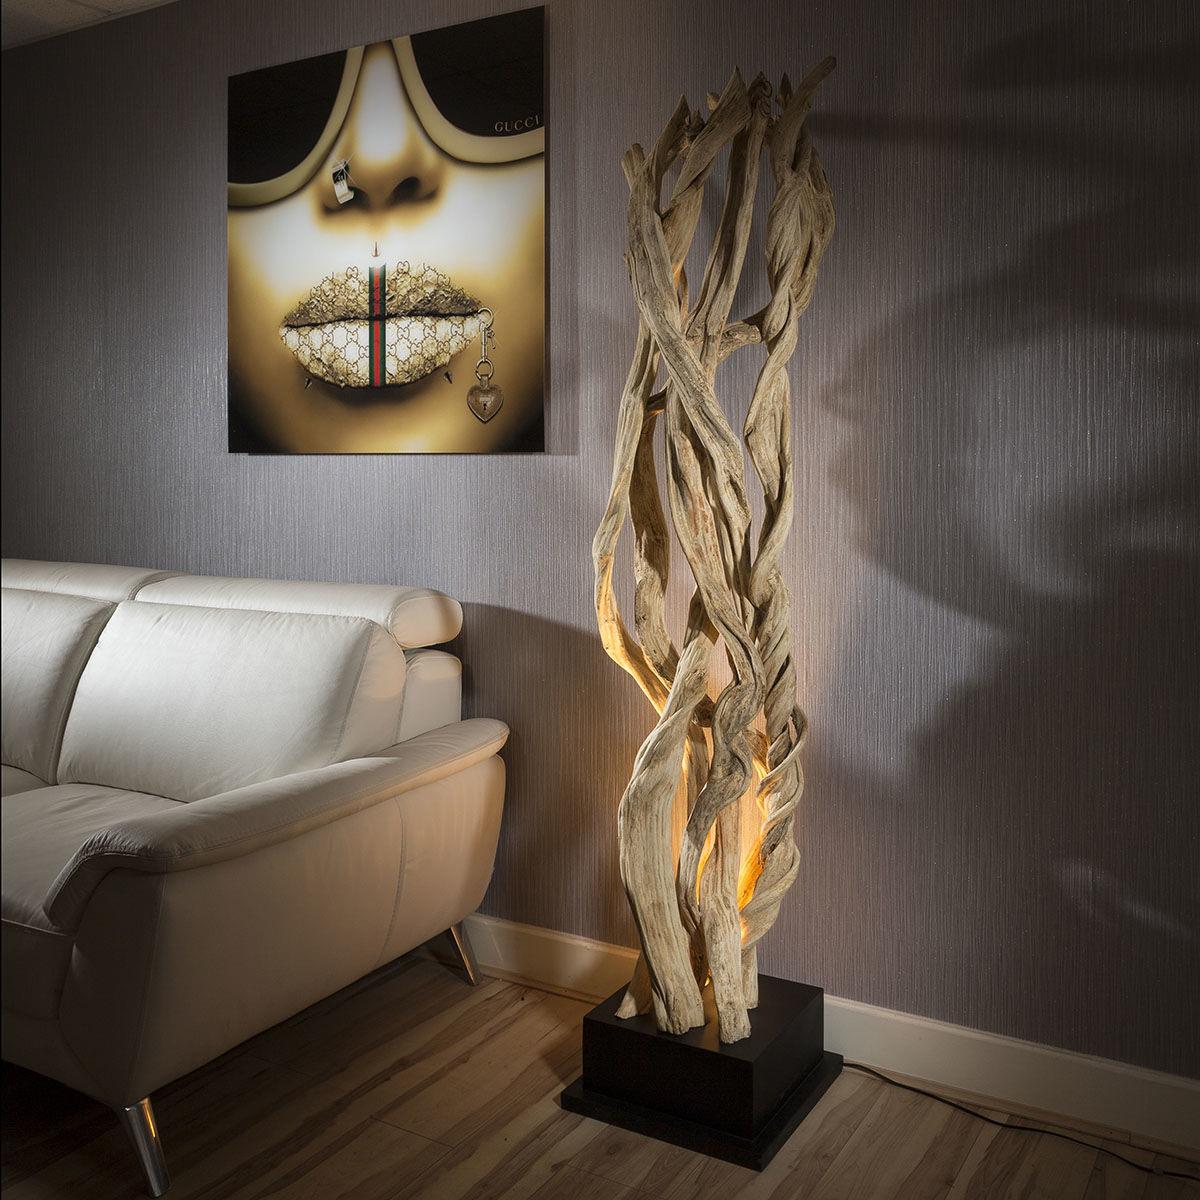 BUY IT · Twist Modern Style Futuristic Floor Lamp: Sometimes interesting